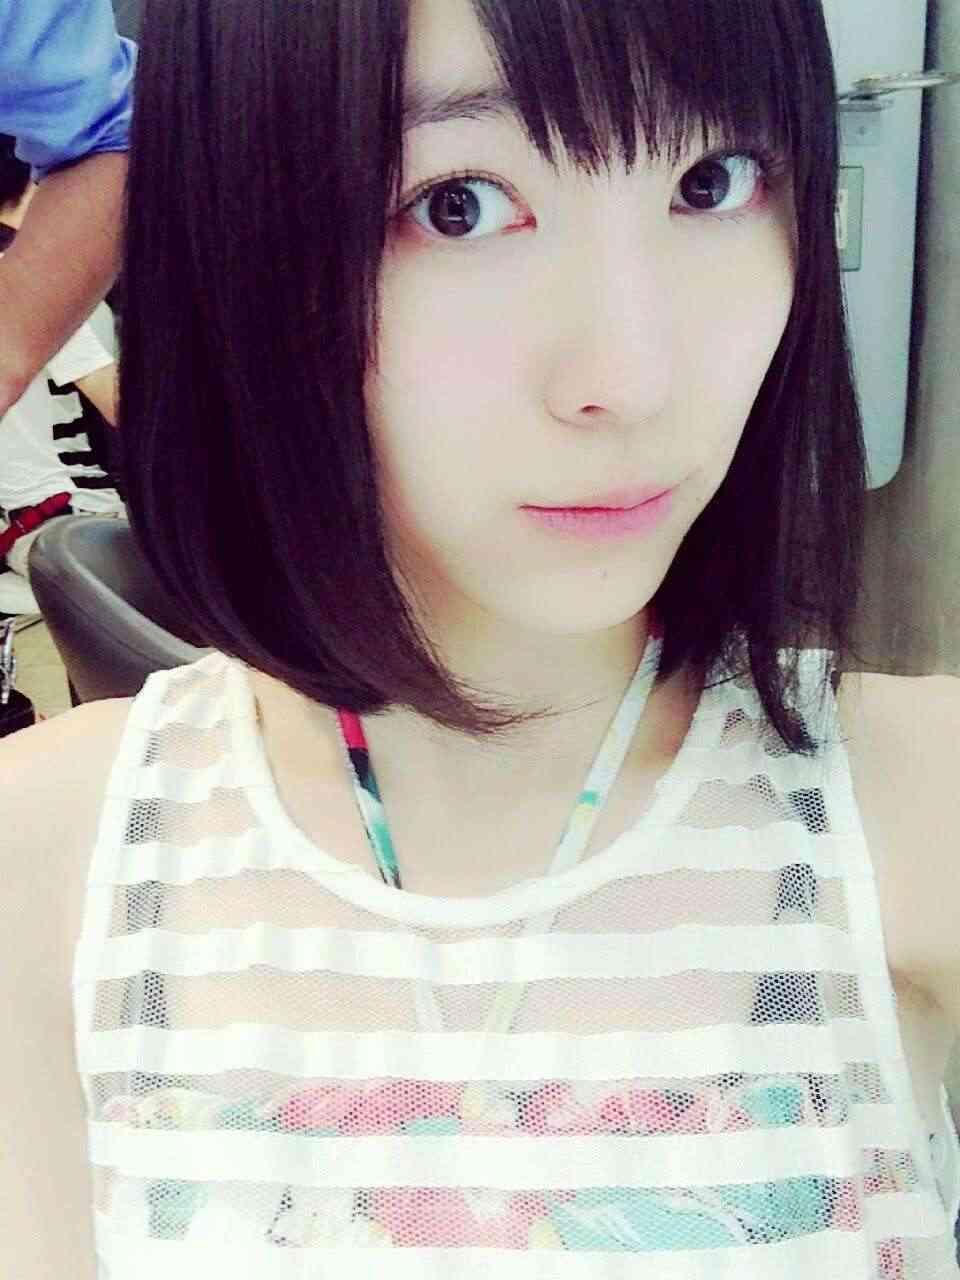 SKE48松井珠理奈の目に整形疑惑…回復して眼帯を取った顔画像が前と違うと話題に